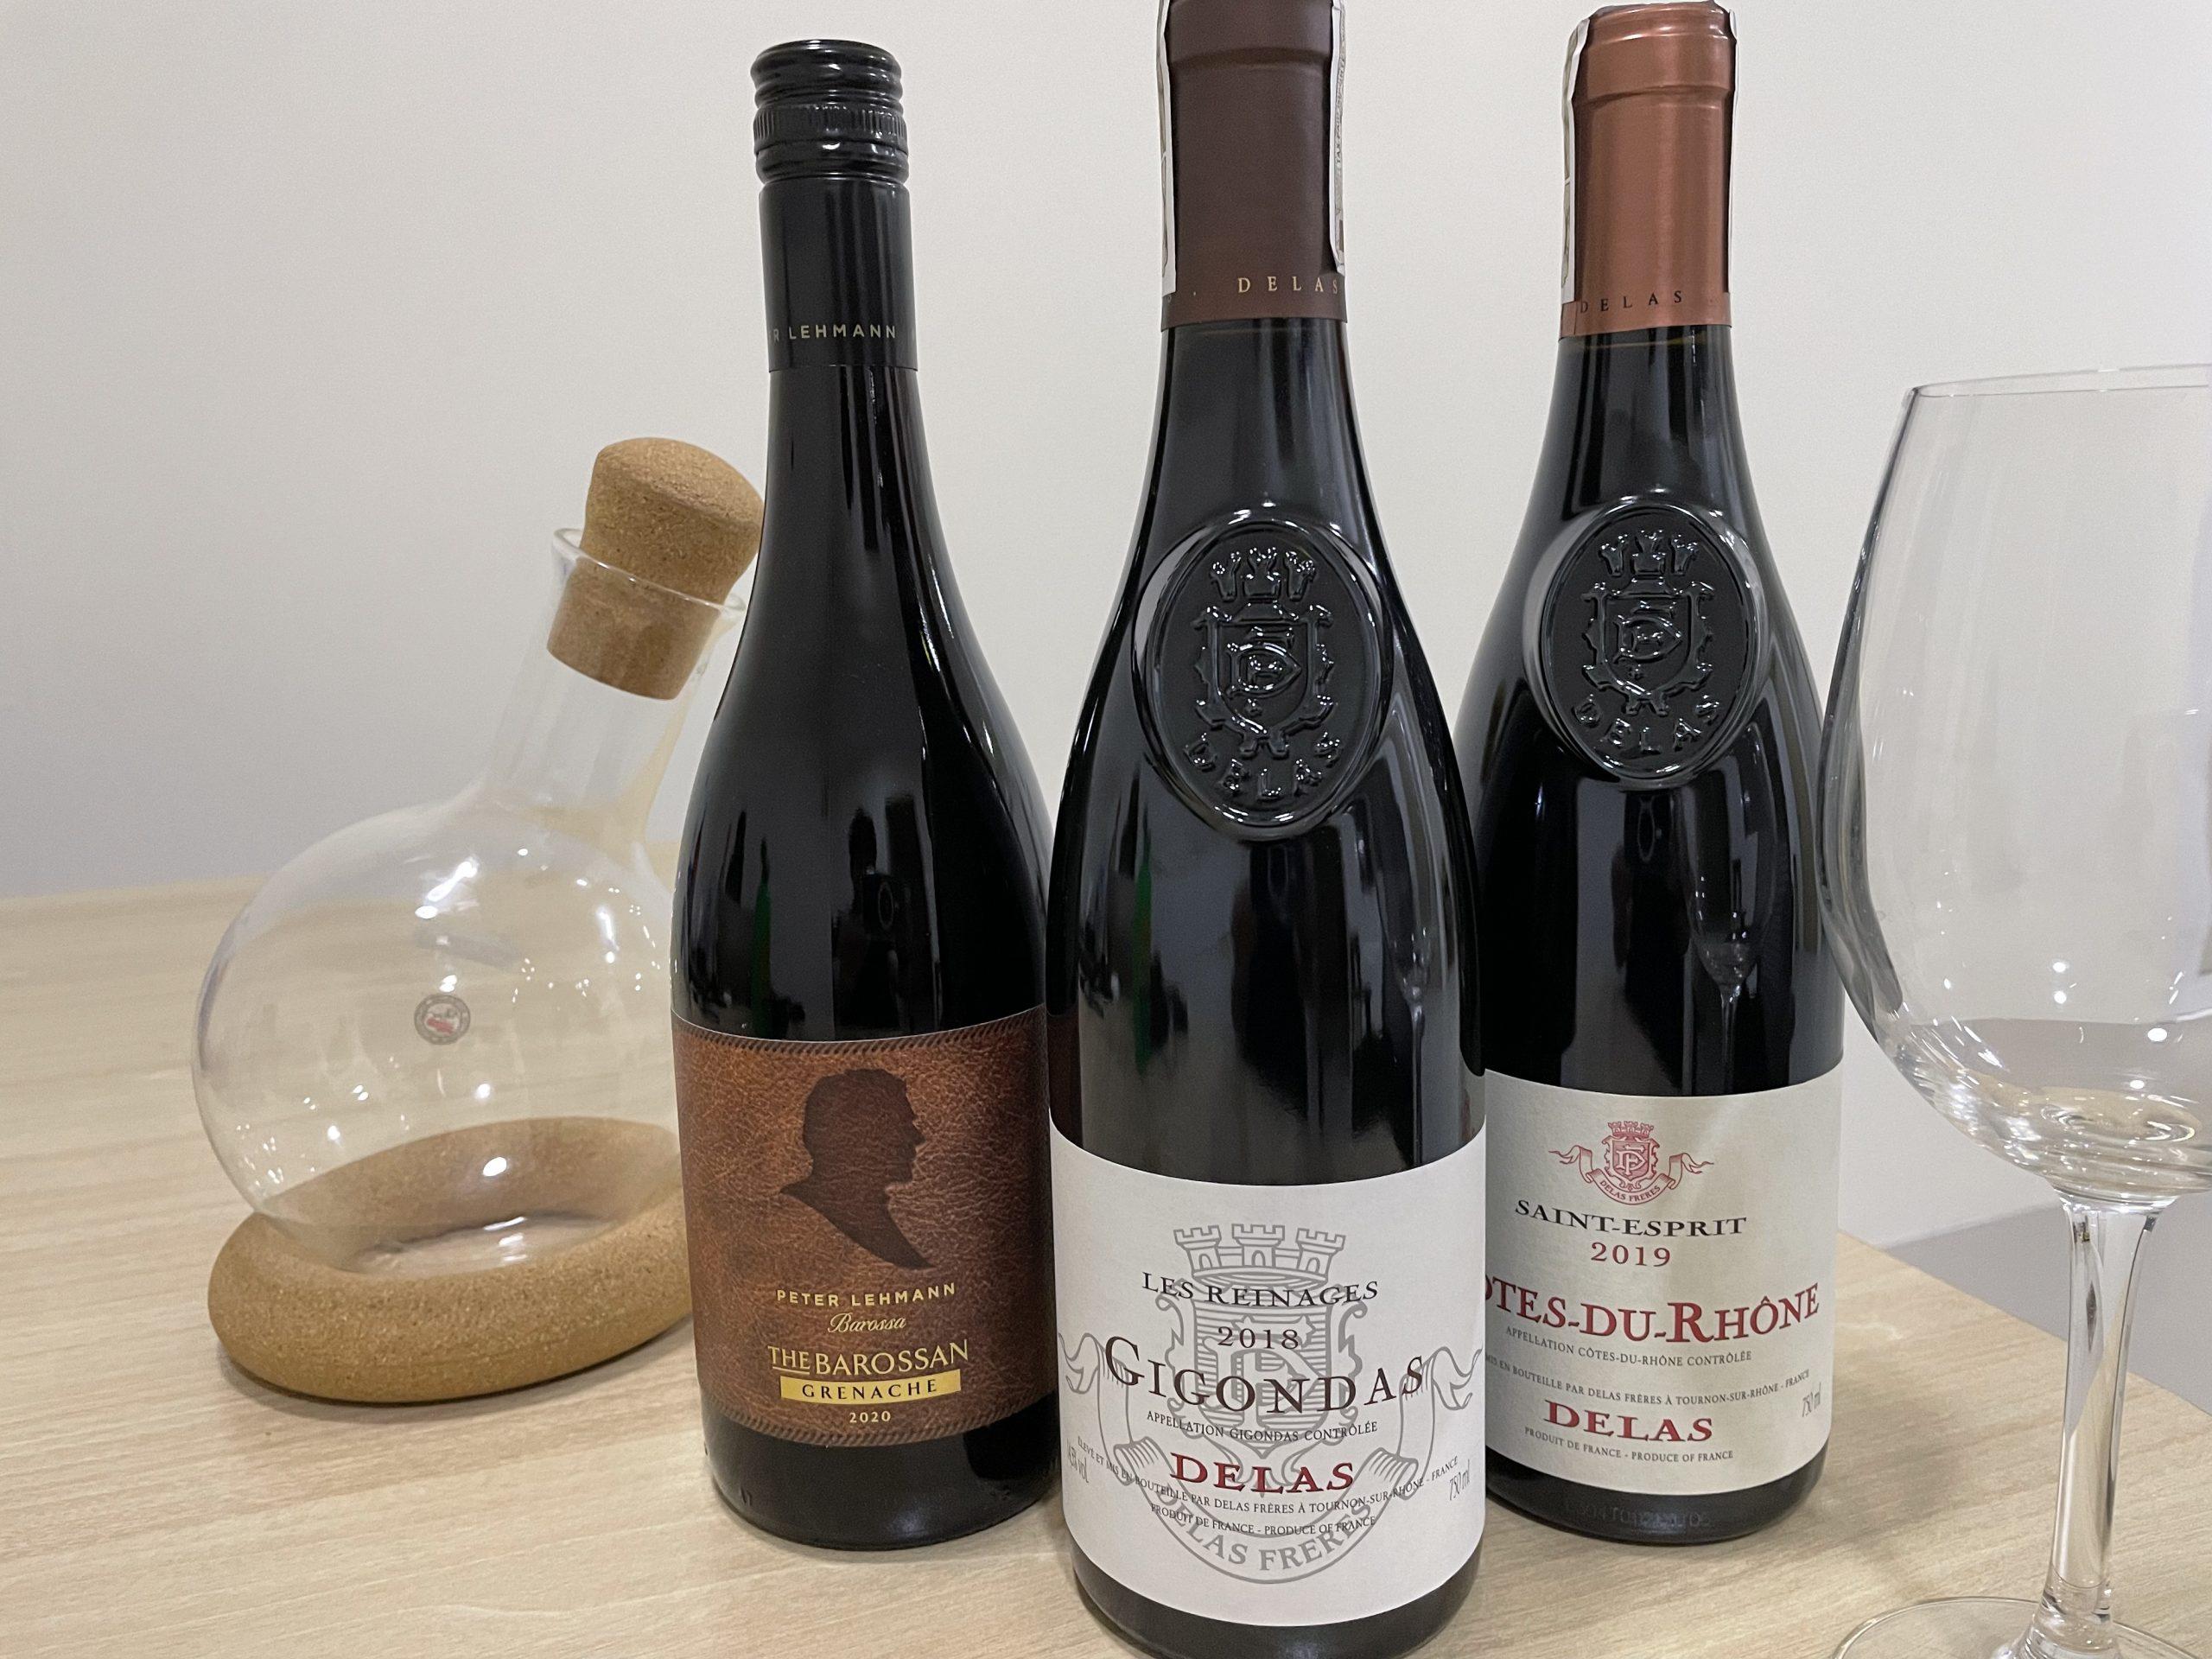 Appreciating the Grenache varietal wine – BusinessWorld Online